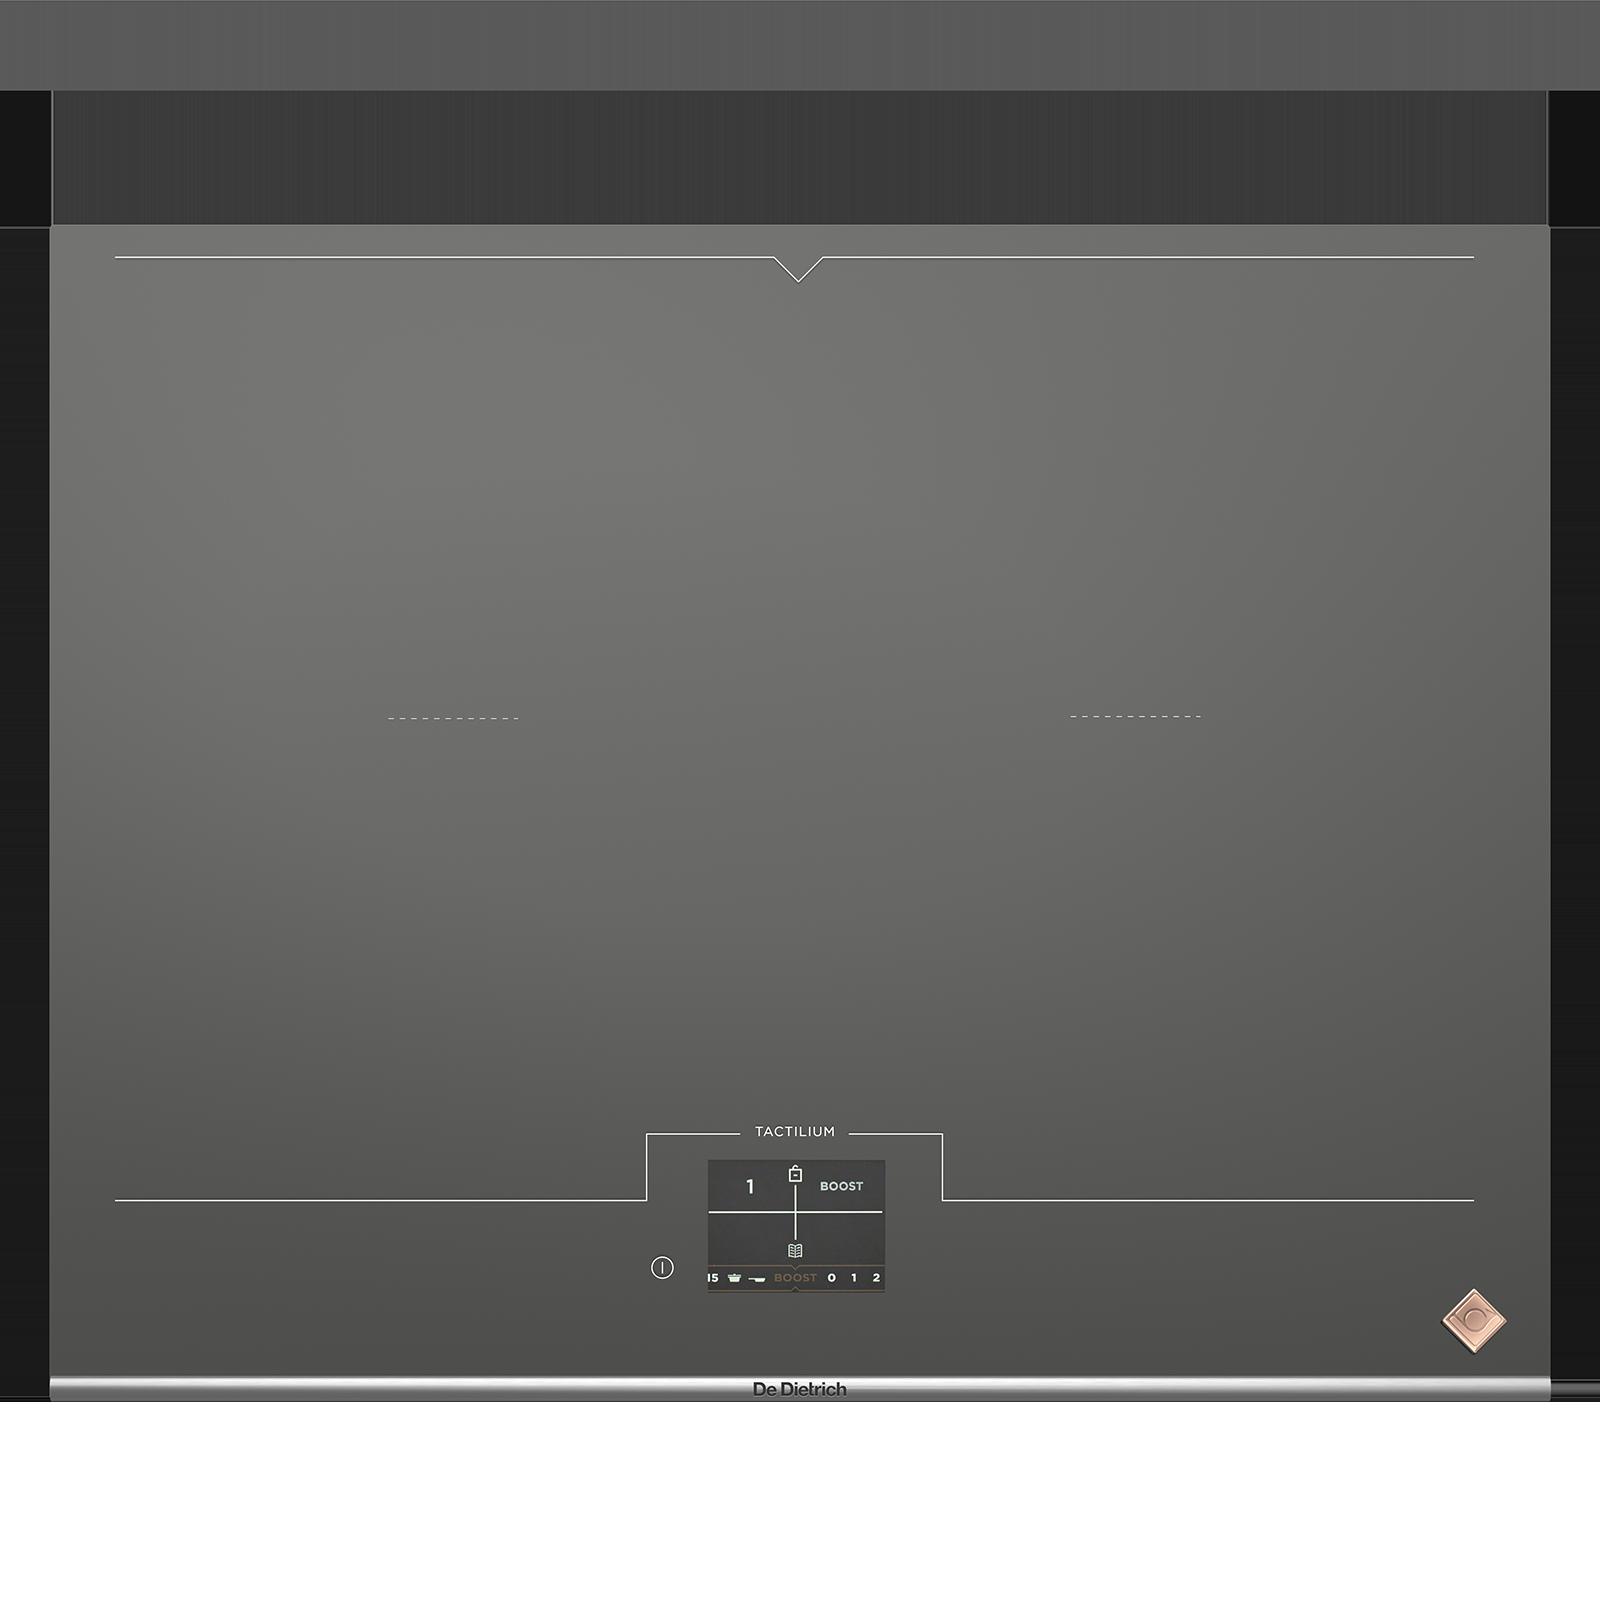 induction hob de dietrich dpi7698g. Black Bedroom Furniture Sets. Home Design Ideas